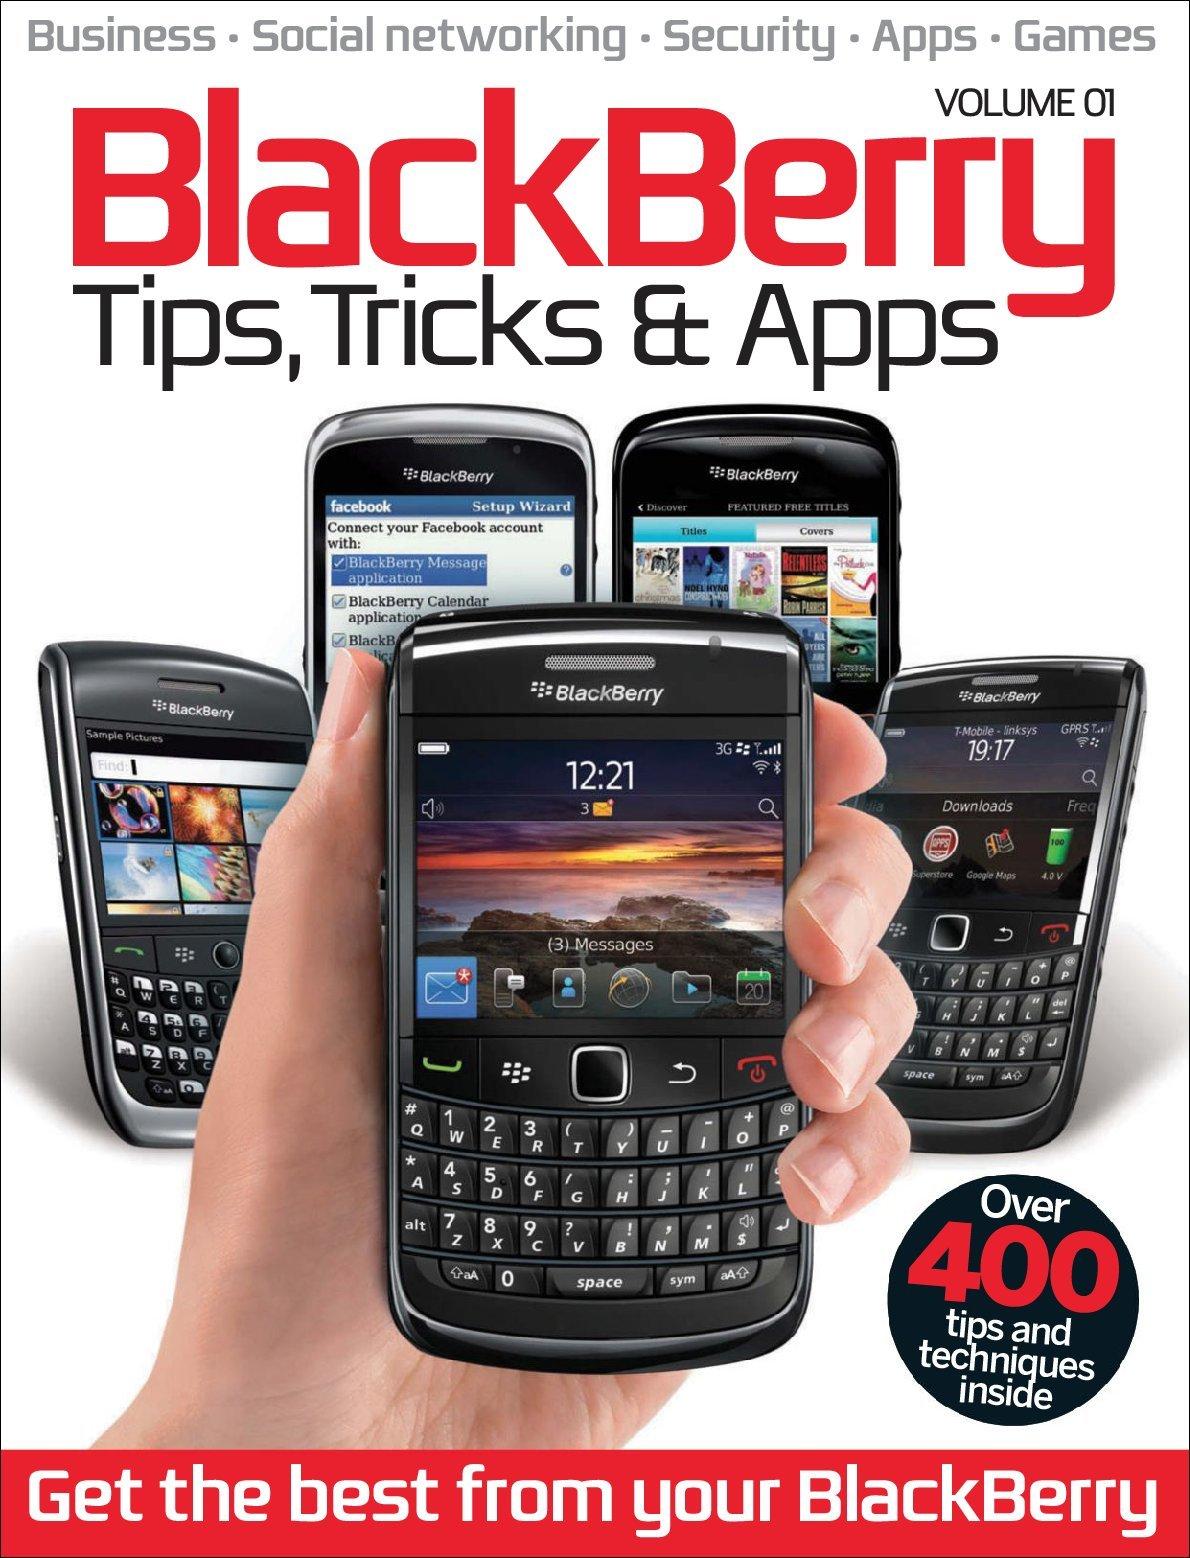 Blackberry Tips Tricks Apps Vol 1 Digital